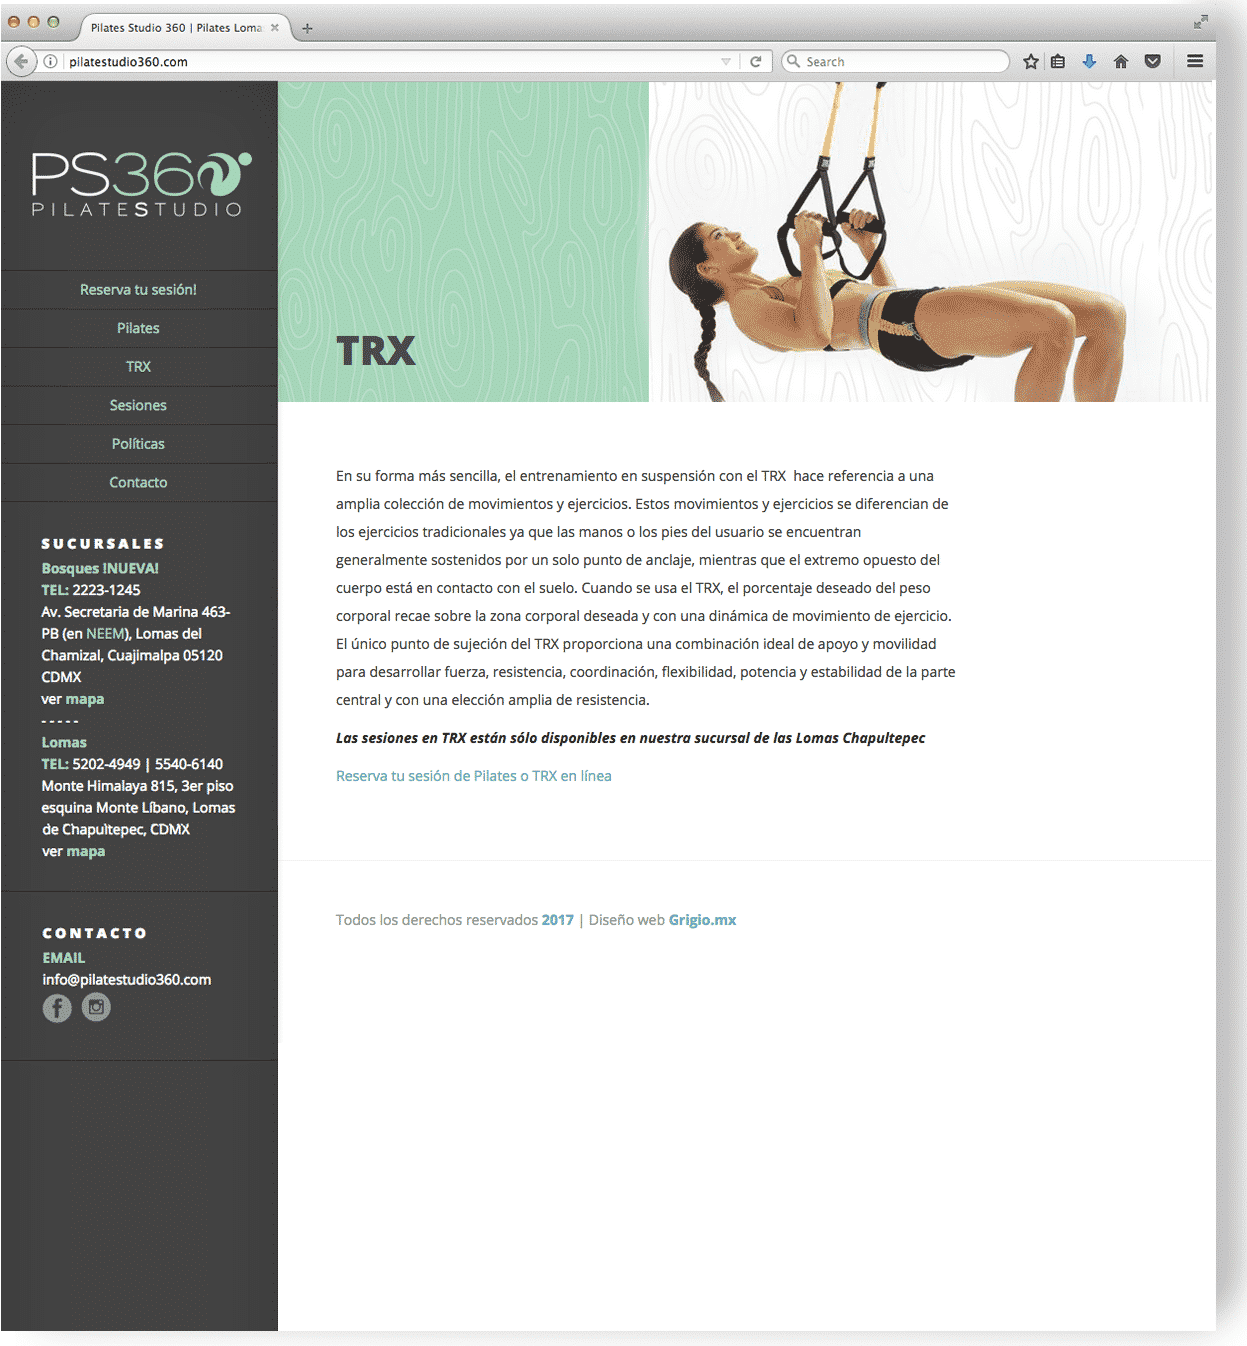 Grigio_web_PStrx